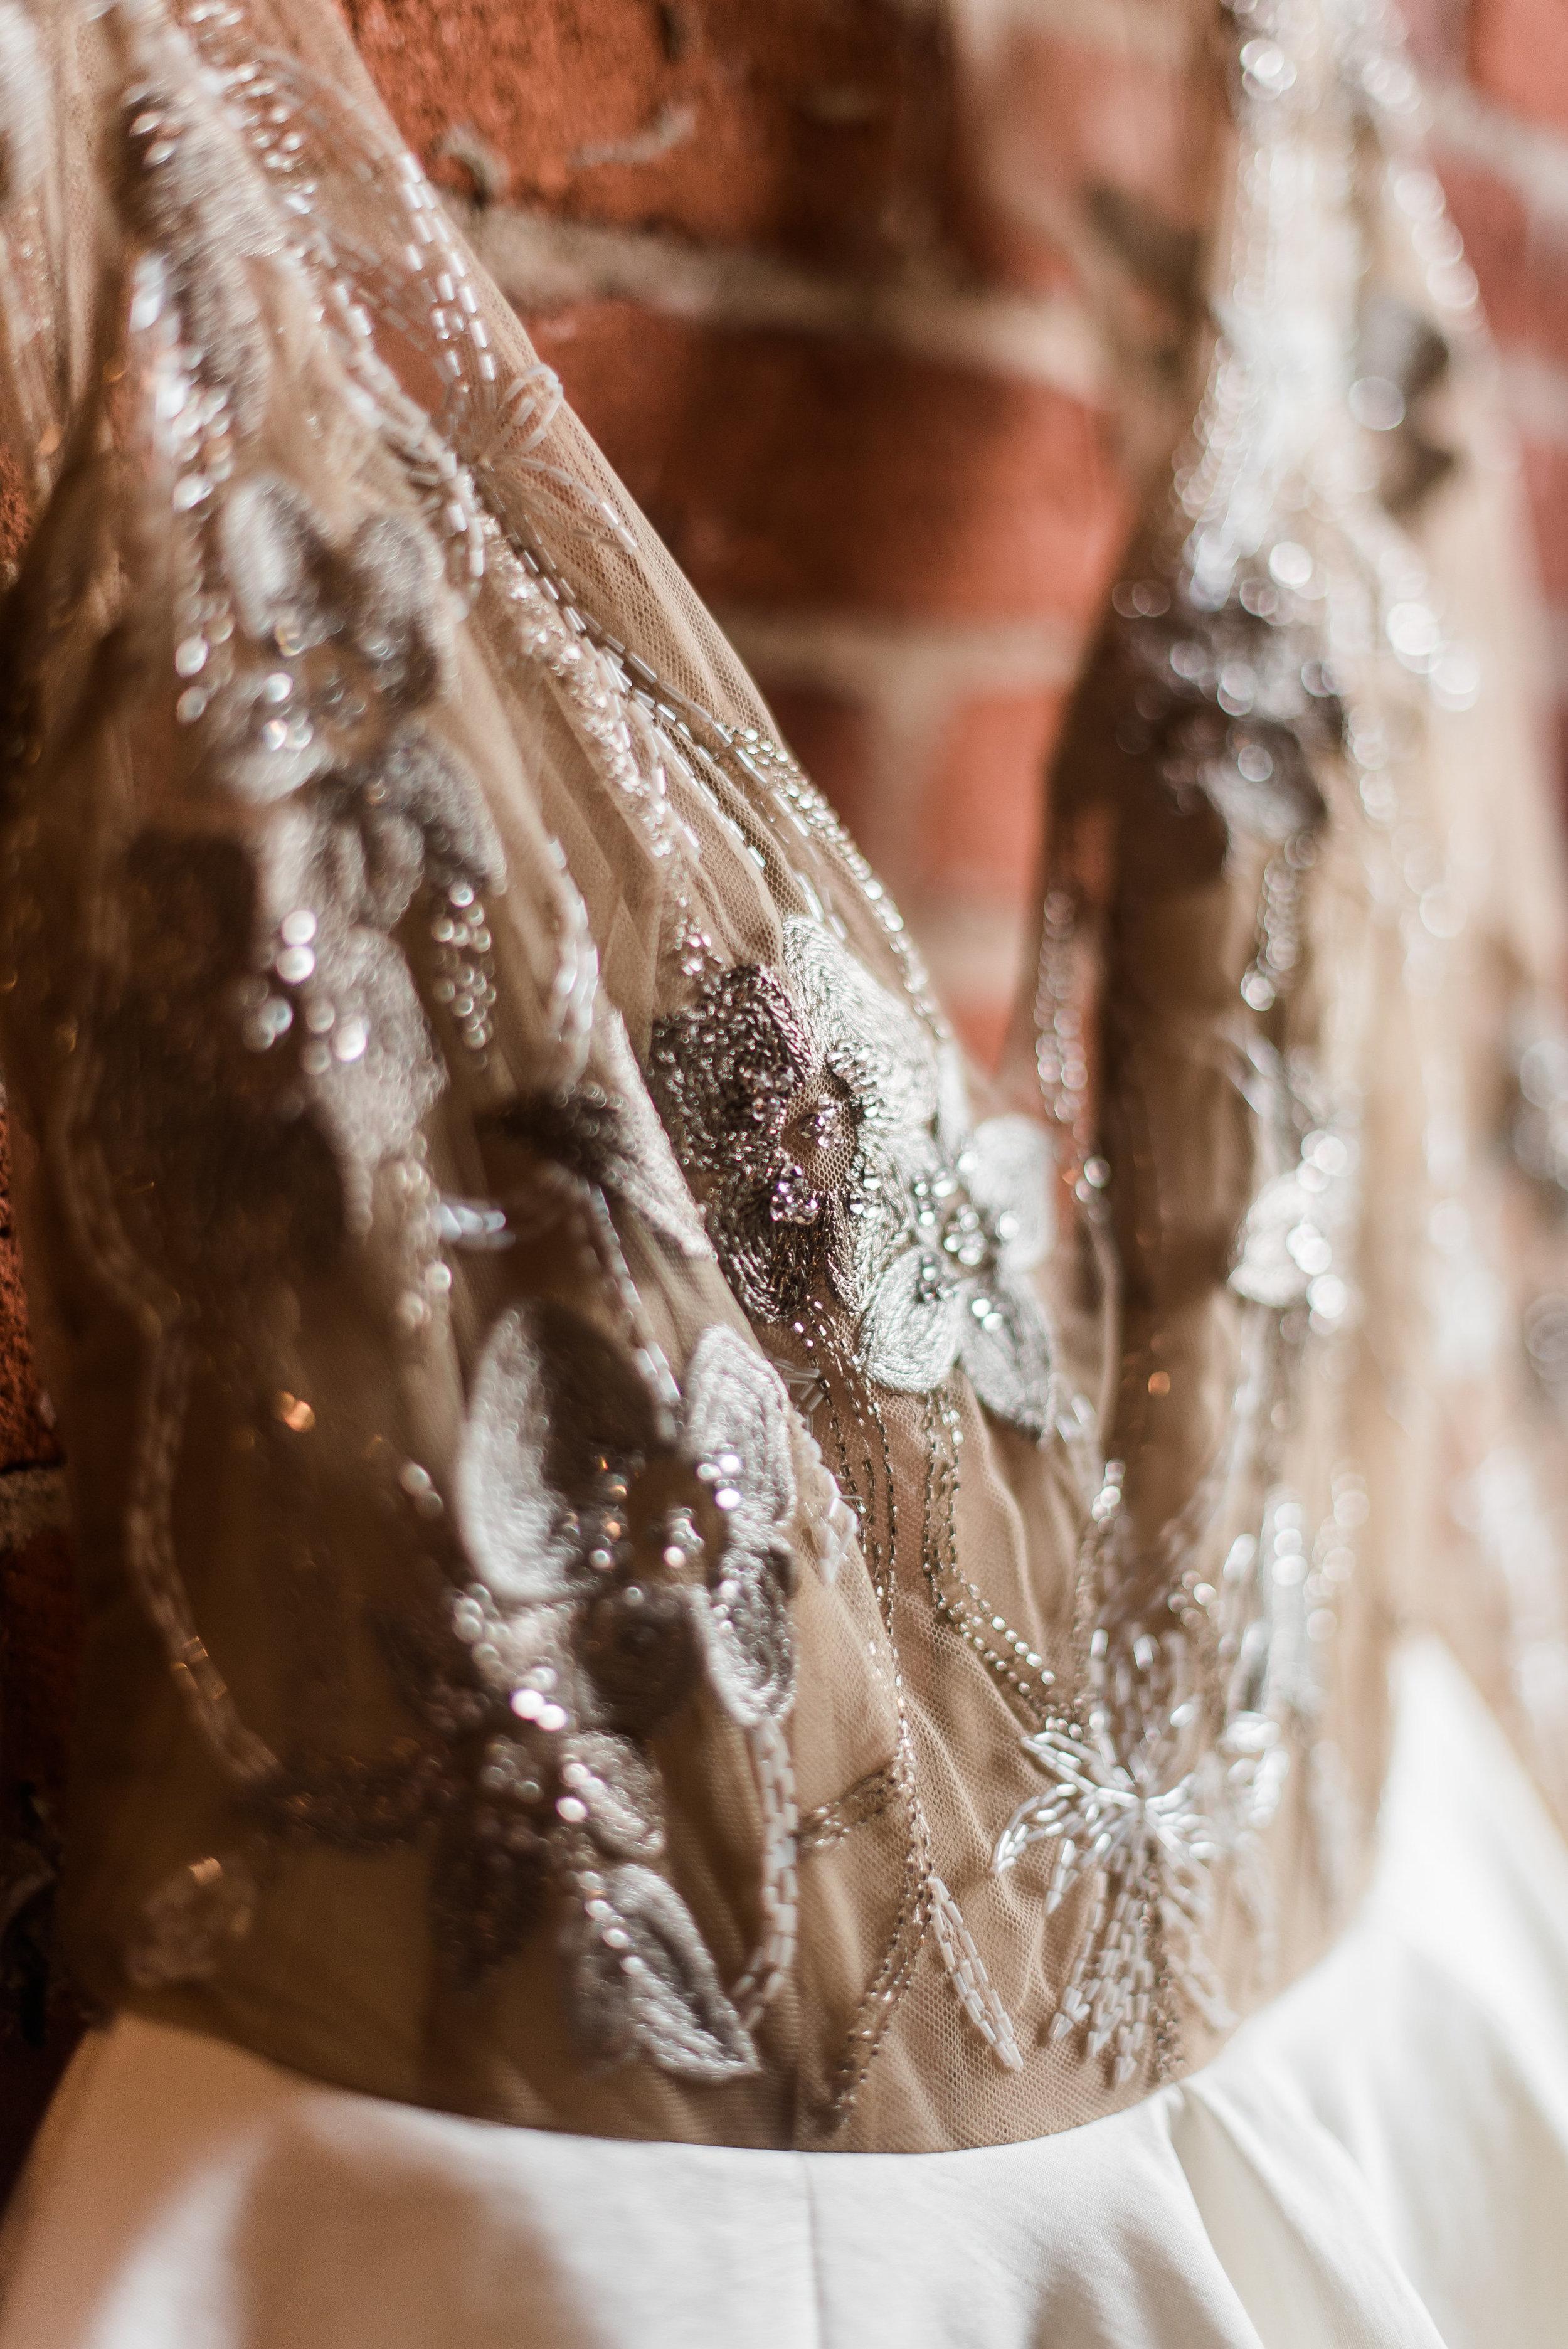 lancaster-wedding-photographer-corkfactory-hotel-industrial-glam-exposedbrick-hayleypaige0211.jpg